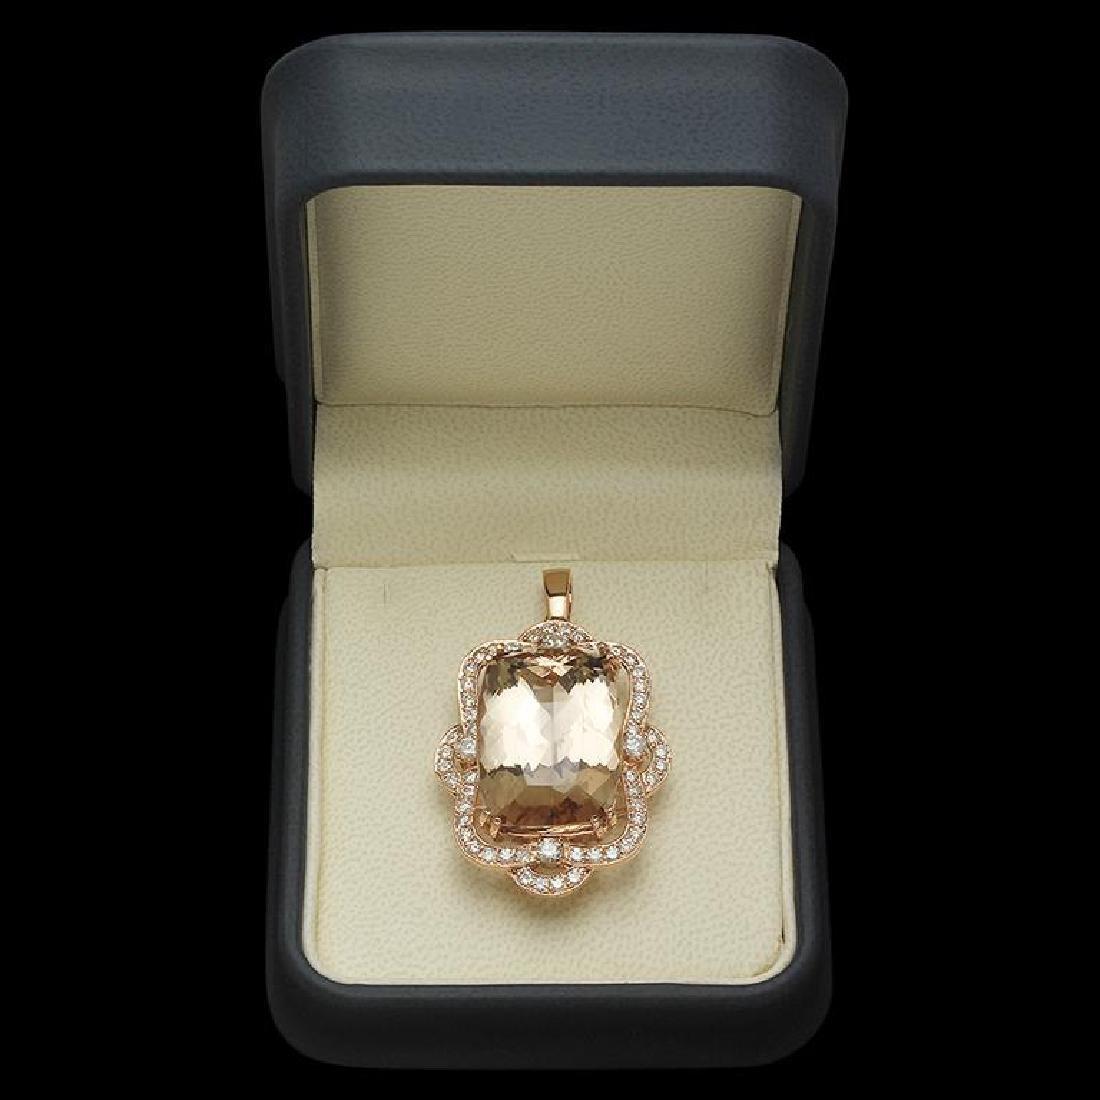 14K Gold 33.52ct Morganite 1.95ct Diamond Pendant - 2